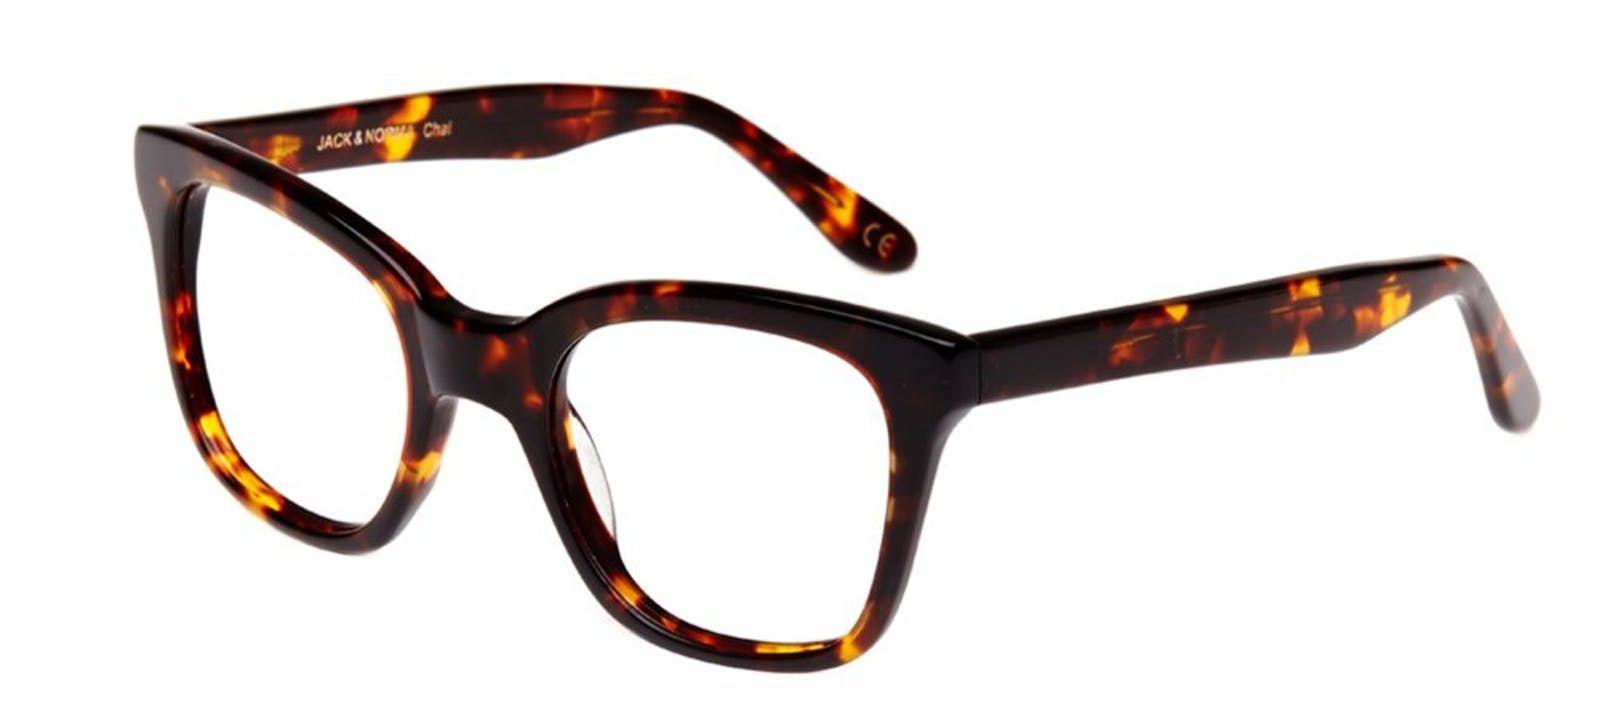 9b07474529 Affordable Fashion Glasses Rectangle Square Eyeglasses Women Jack   Norma  chai Tilt